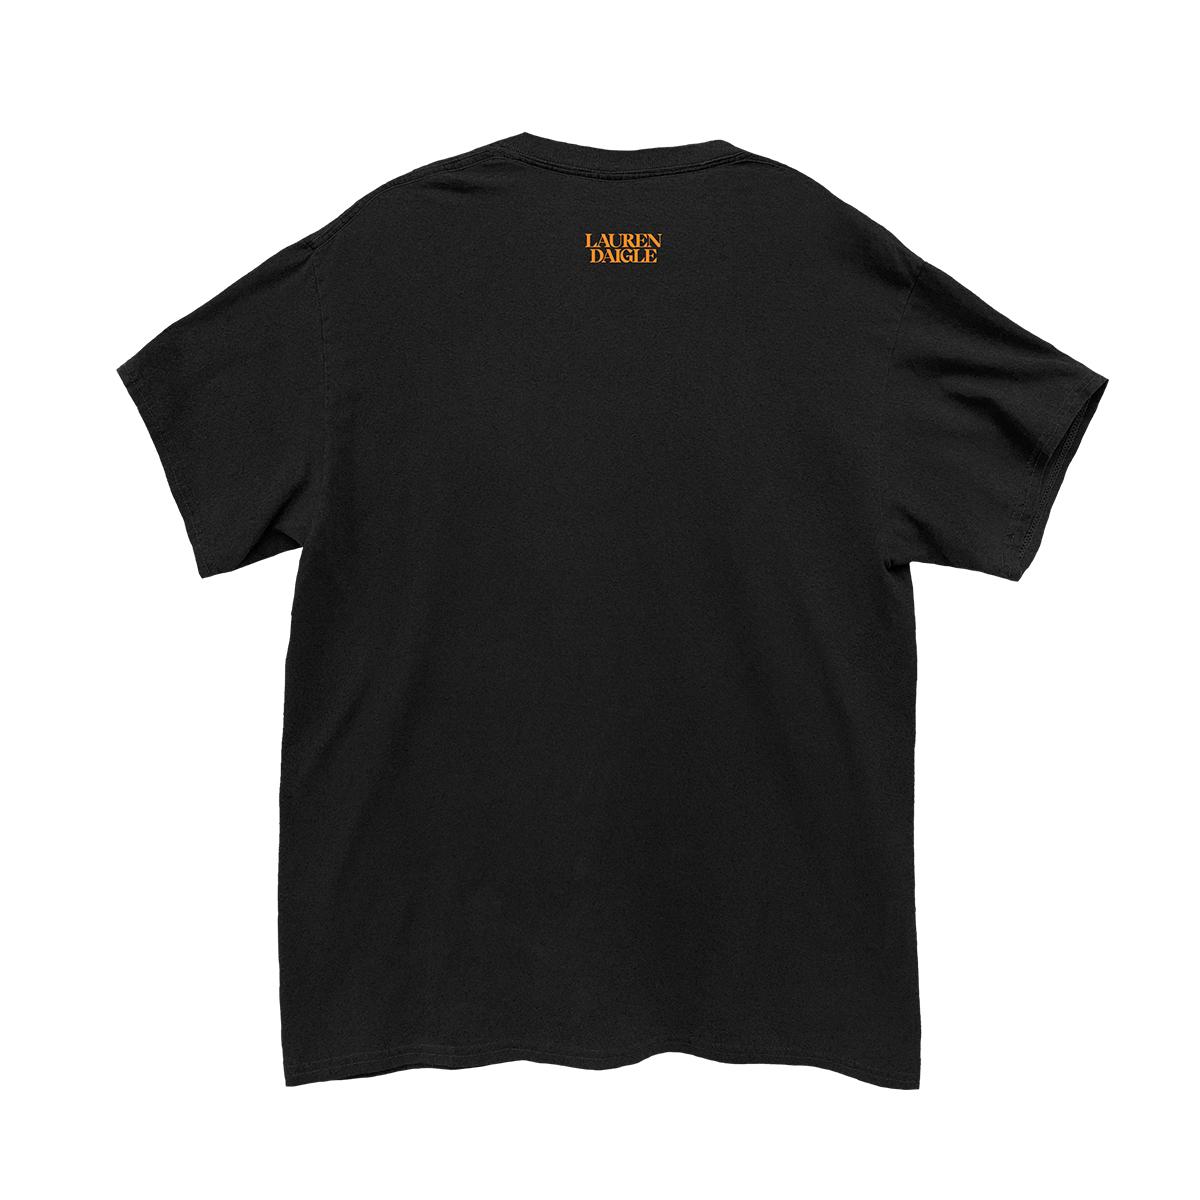 Ain't Going Anywhere Black T-shirt